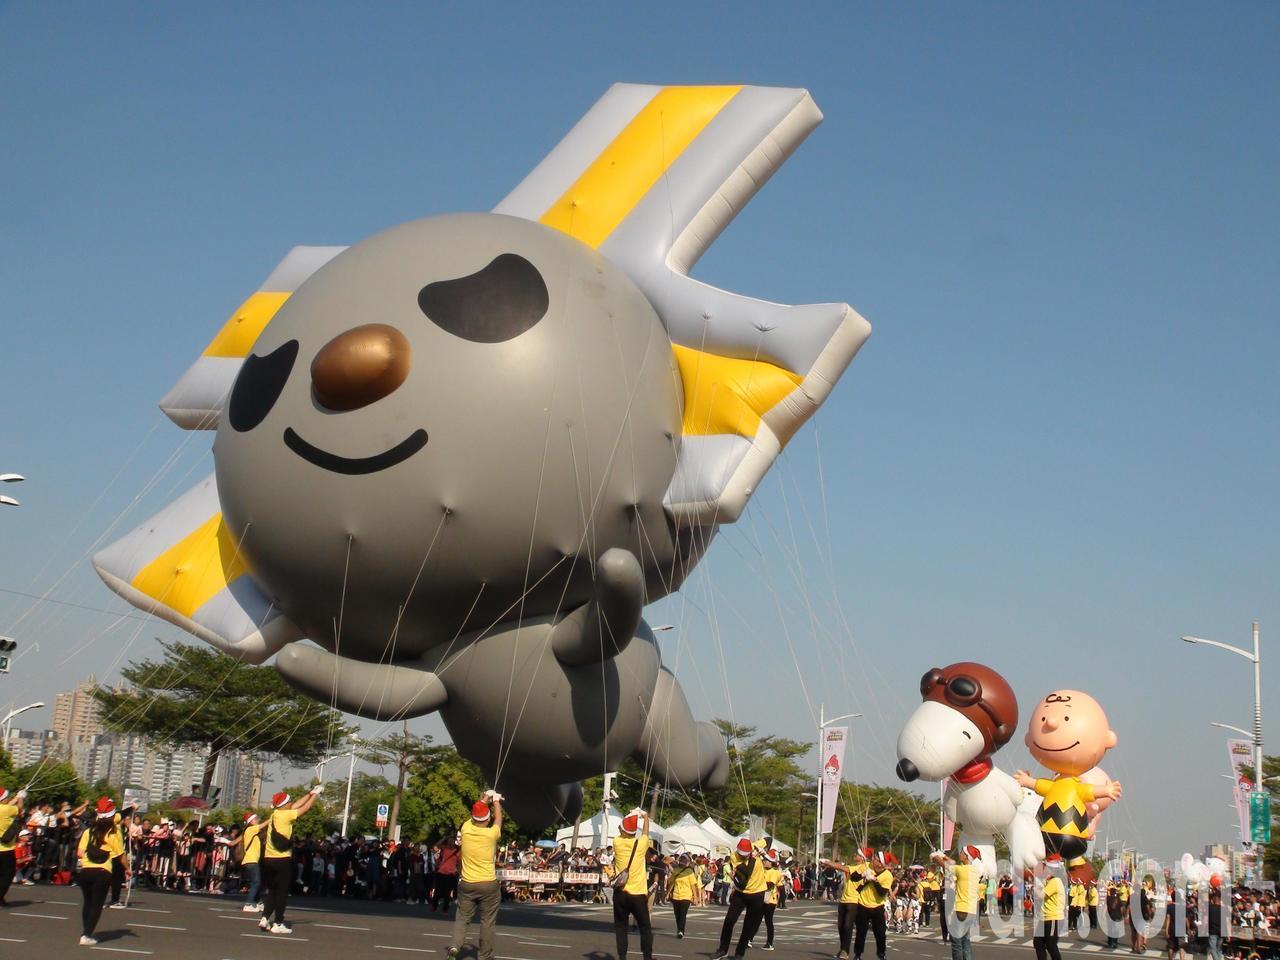 「OPEN!大氣球遊行」今年邁入第14屆,今天有20組卡通大氣球,有史奴比、查理...